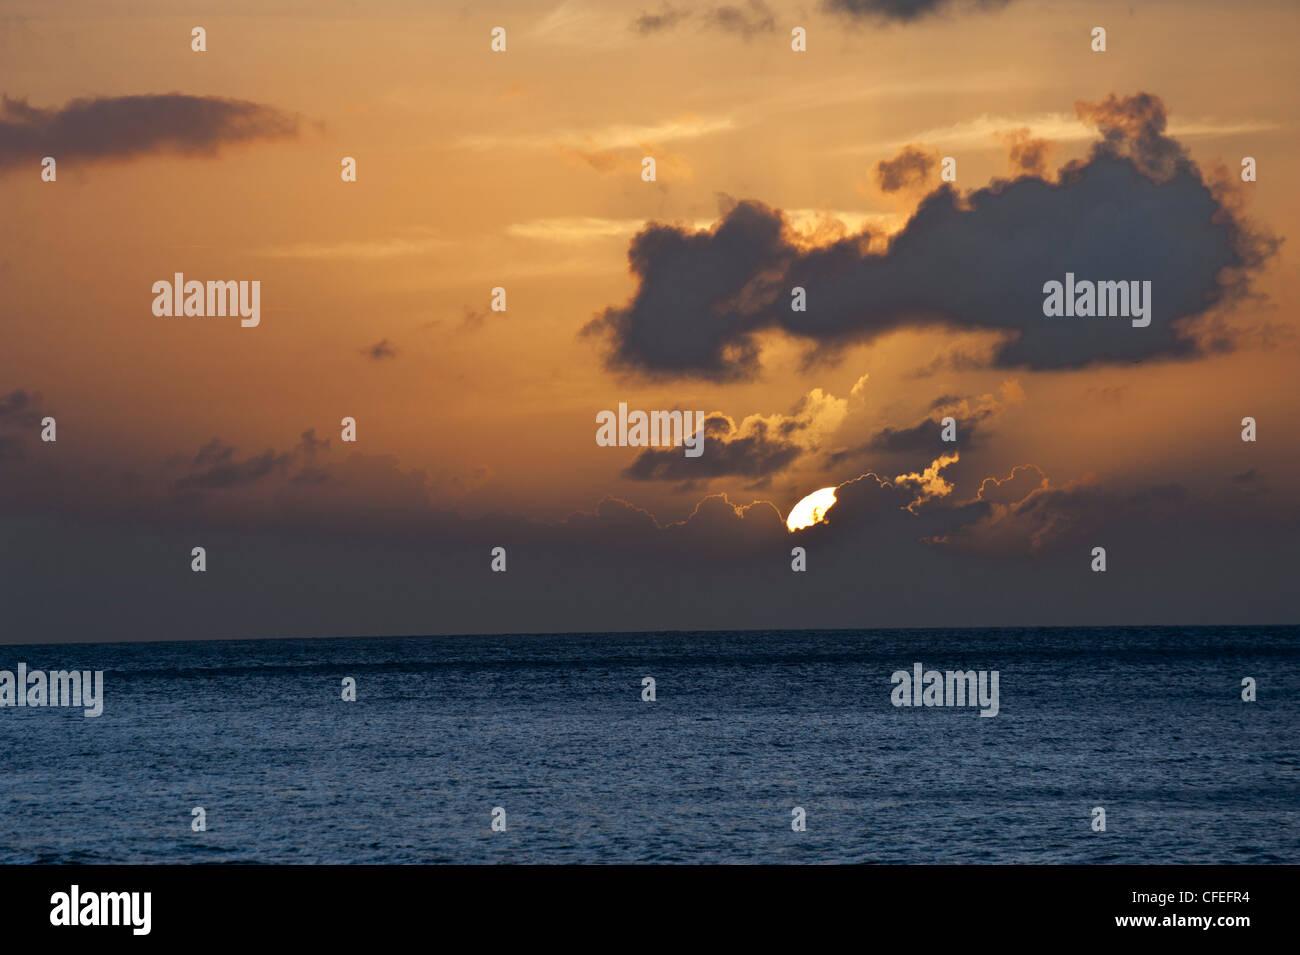 Dramatic Sunset in Grand Case, Saint Martin (French Saint-Martin; Dutch: Sint Maarten) an island in the northeast - Stock Image